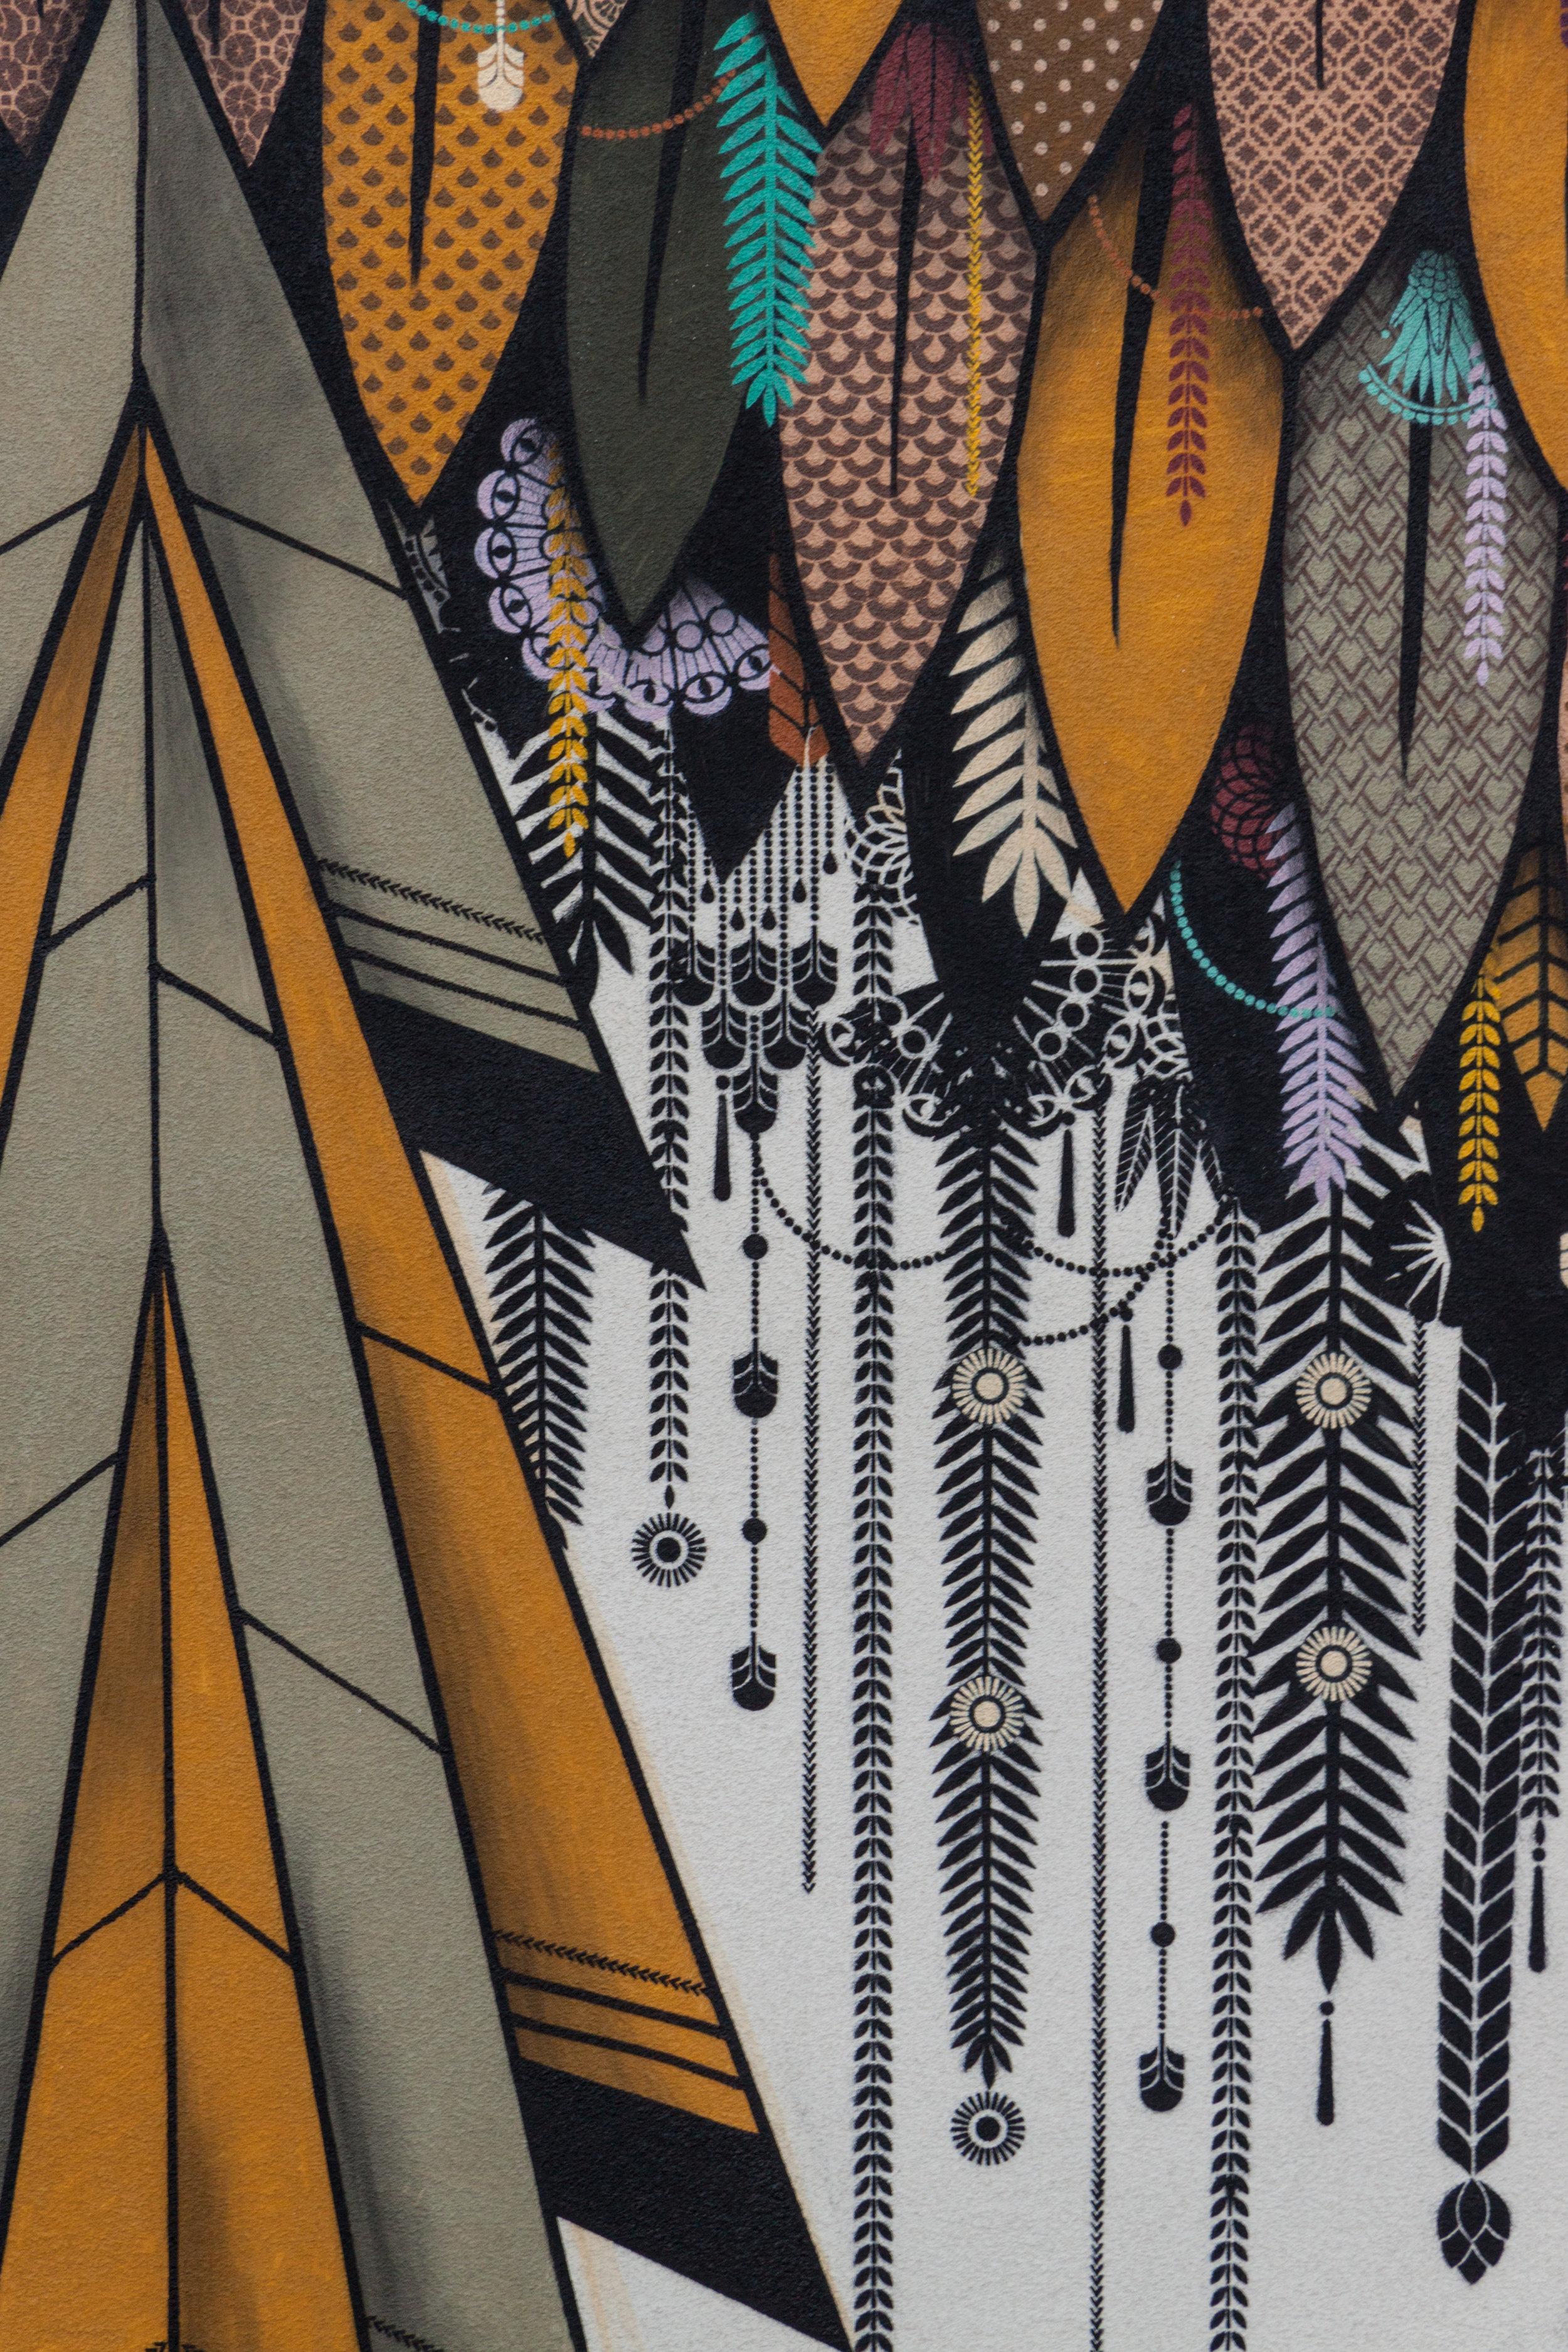 KORALIE&SUPAKITSCH_Artscape_2016-08-10_FredrikÅkerberg_3168x4752_25.jpg